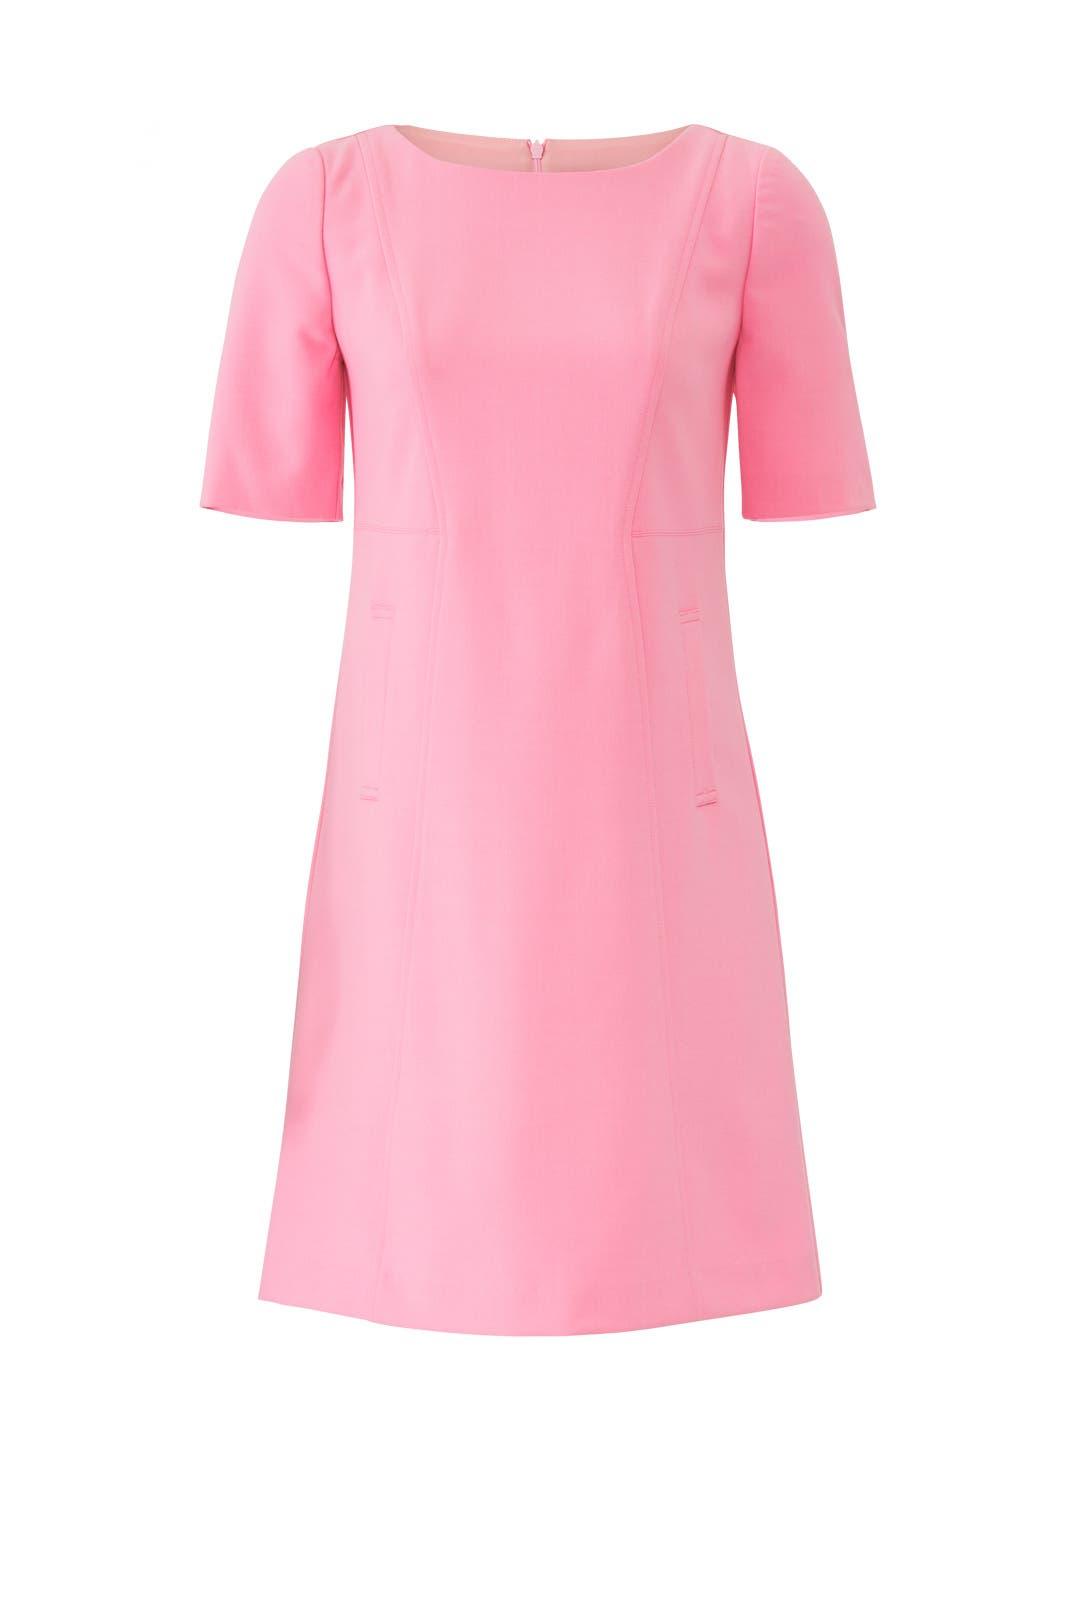 cd0ef579fef Kiosk Dress by Trina Turk for  50